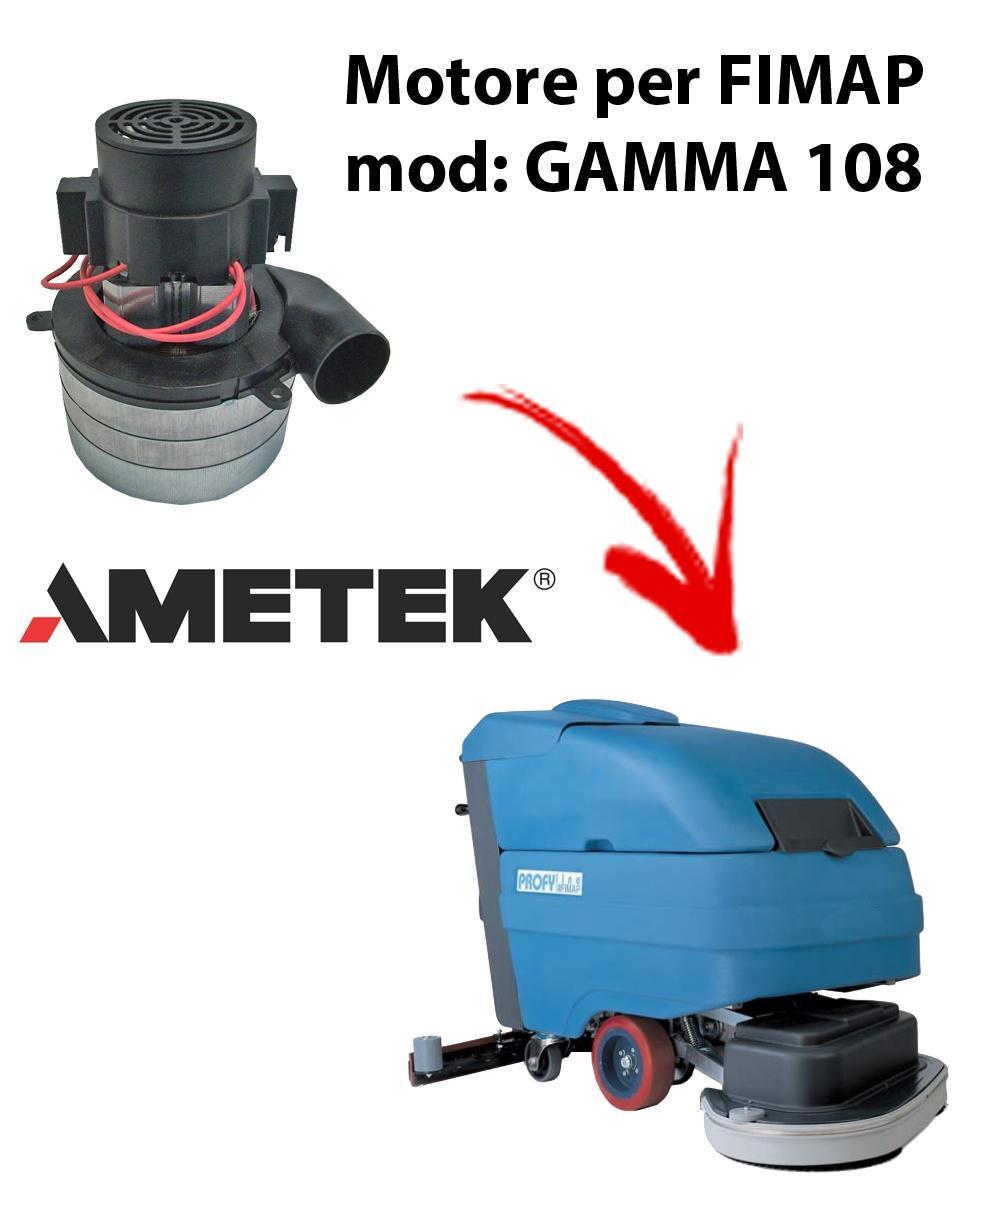 GAMMA 108 Saugmotor AMETEK ITALIA für scheuersaugmaschinen FIMAP